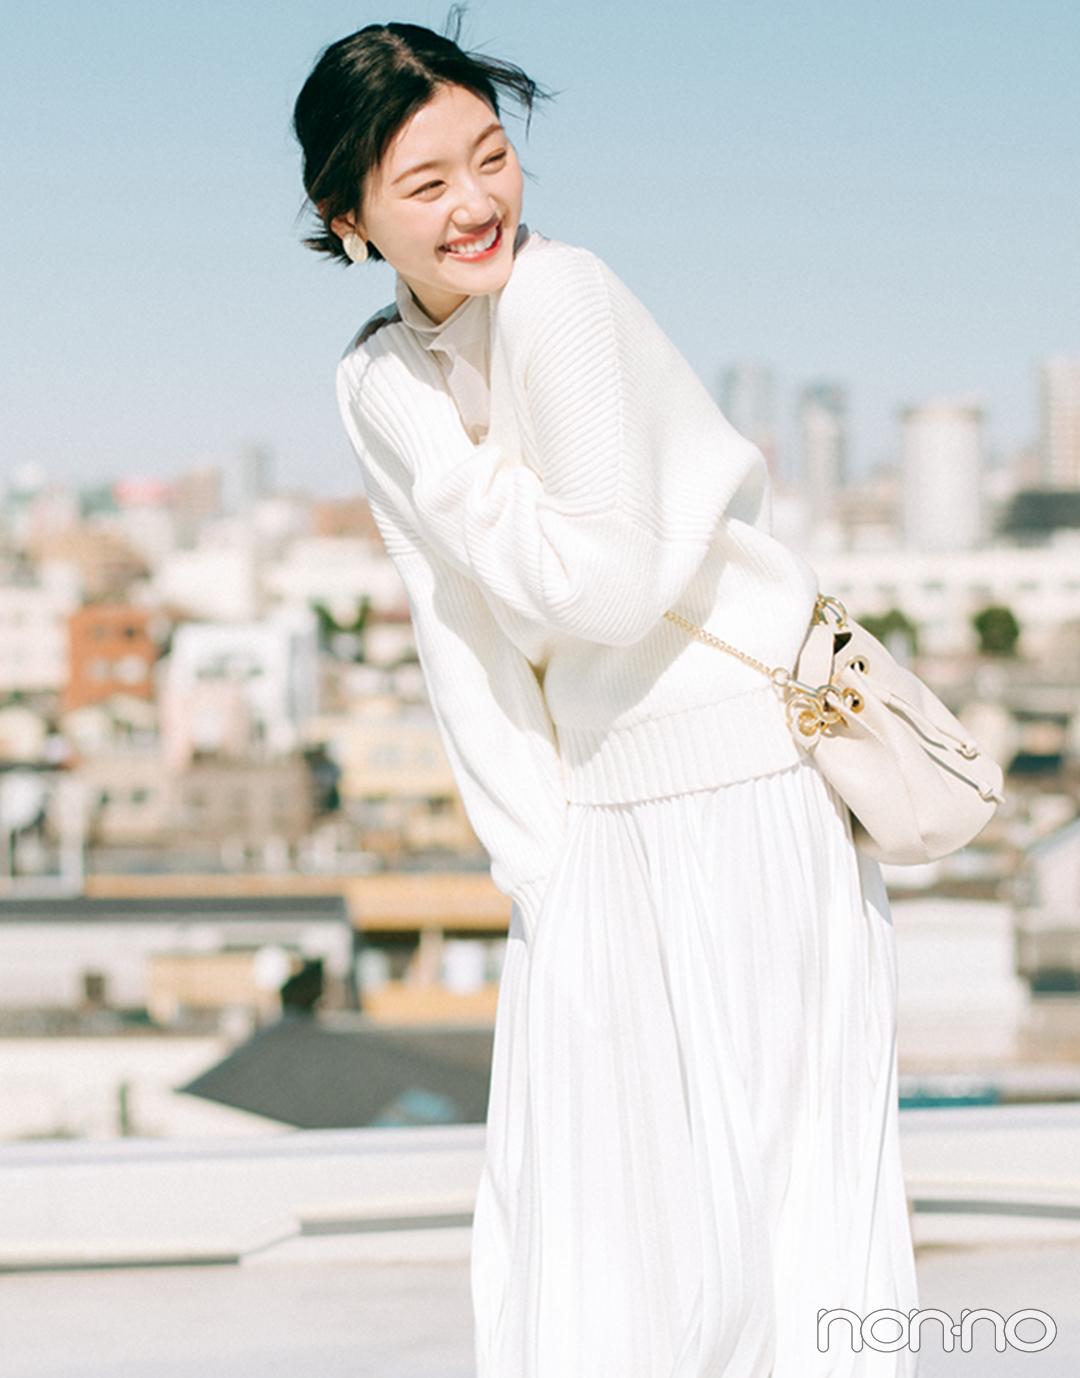 Photo Gallery|笑顔が最高の癒し! 佐々木美玲(日向坂46)フォトギャラリー_1_4